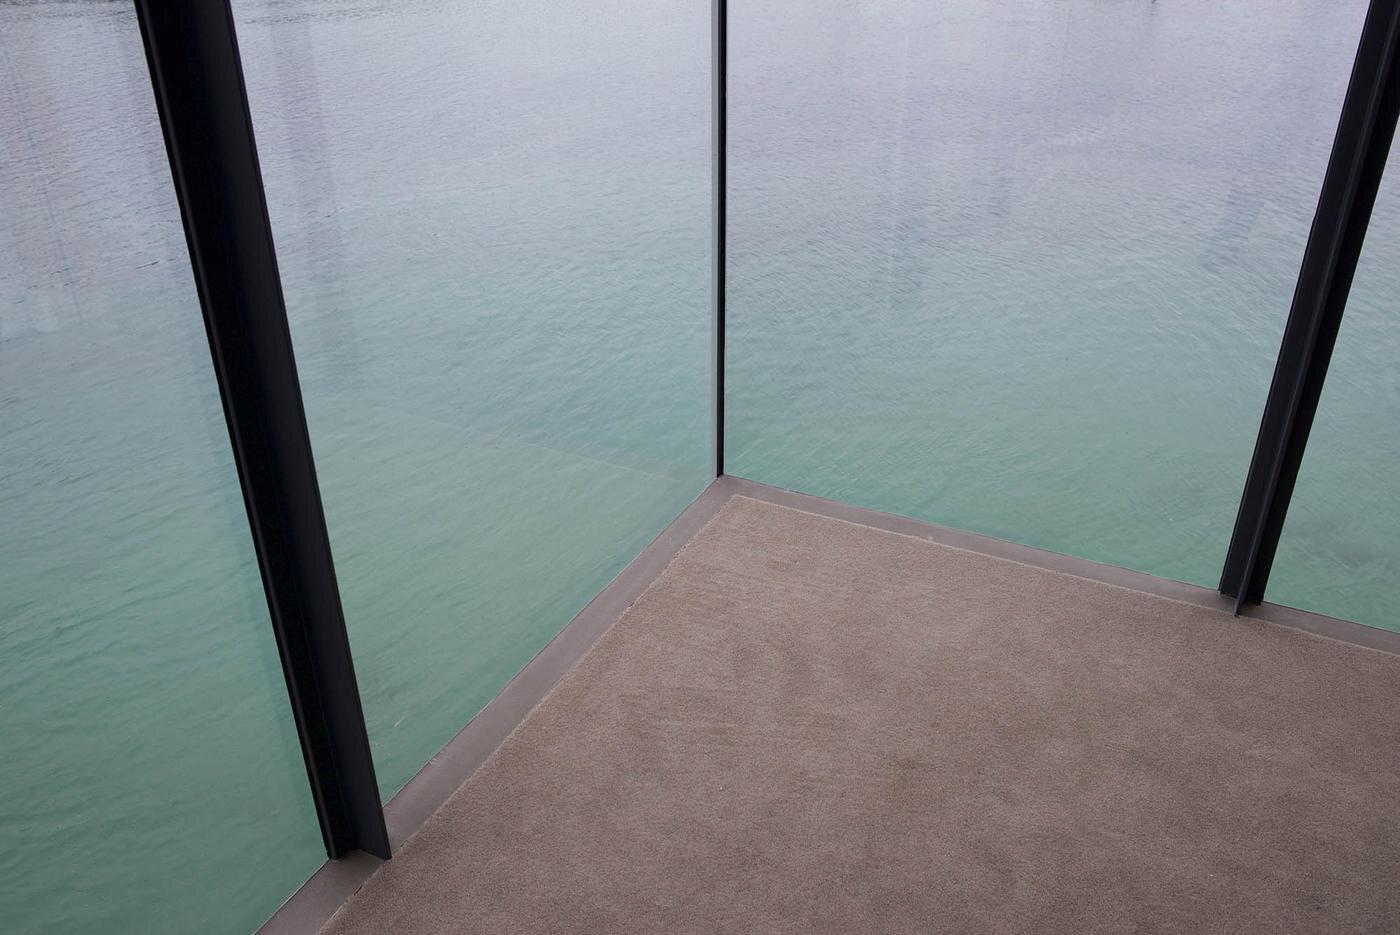 Manshausen Island Resort - Stinessen Arkitektur - Norway - Water View - Humble Homes